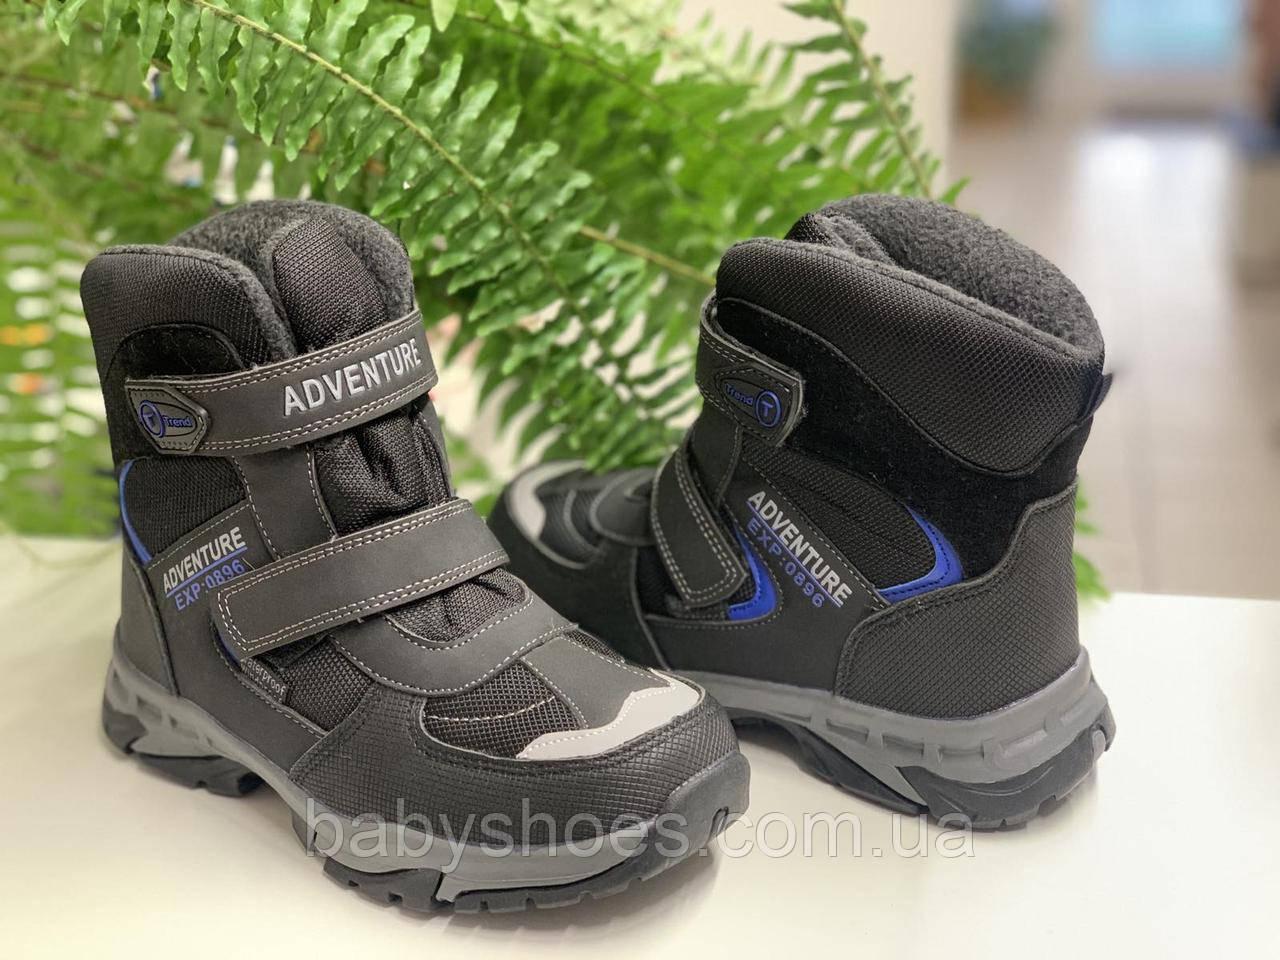 Зимние термо-ботинки для мальчика Tom.m  р.35-37, ЗМ-200